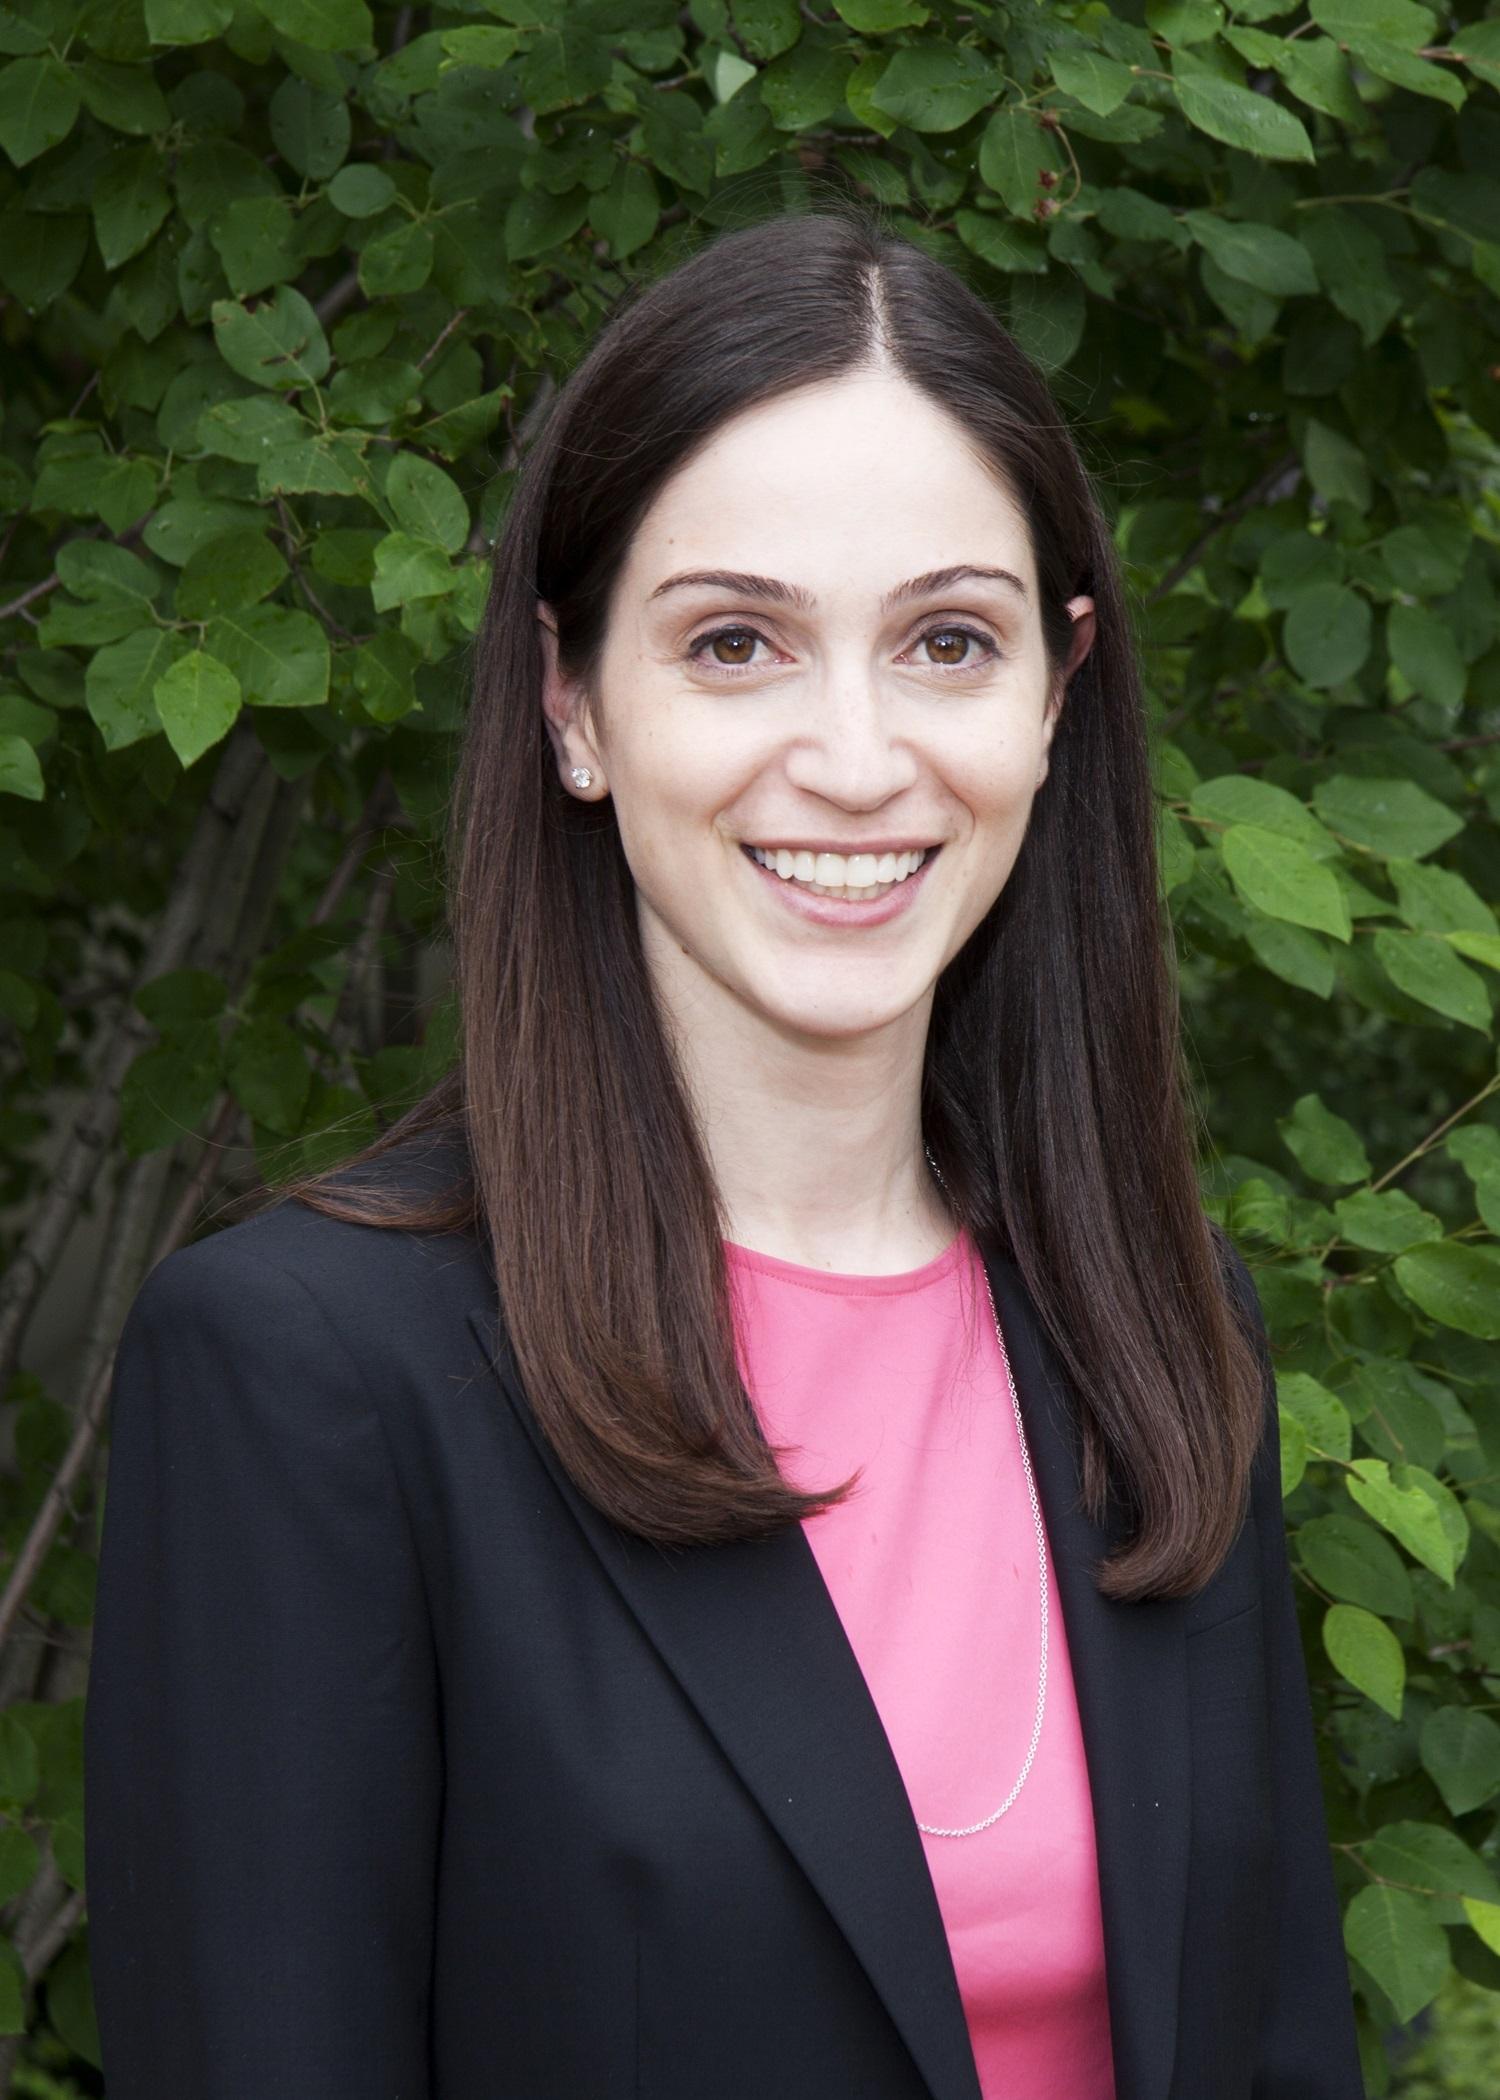 Pediatric & Adult Strabismus Ophthalmologist Alexandra O. Apkarian, MD